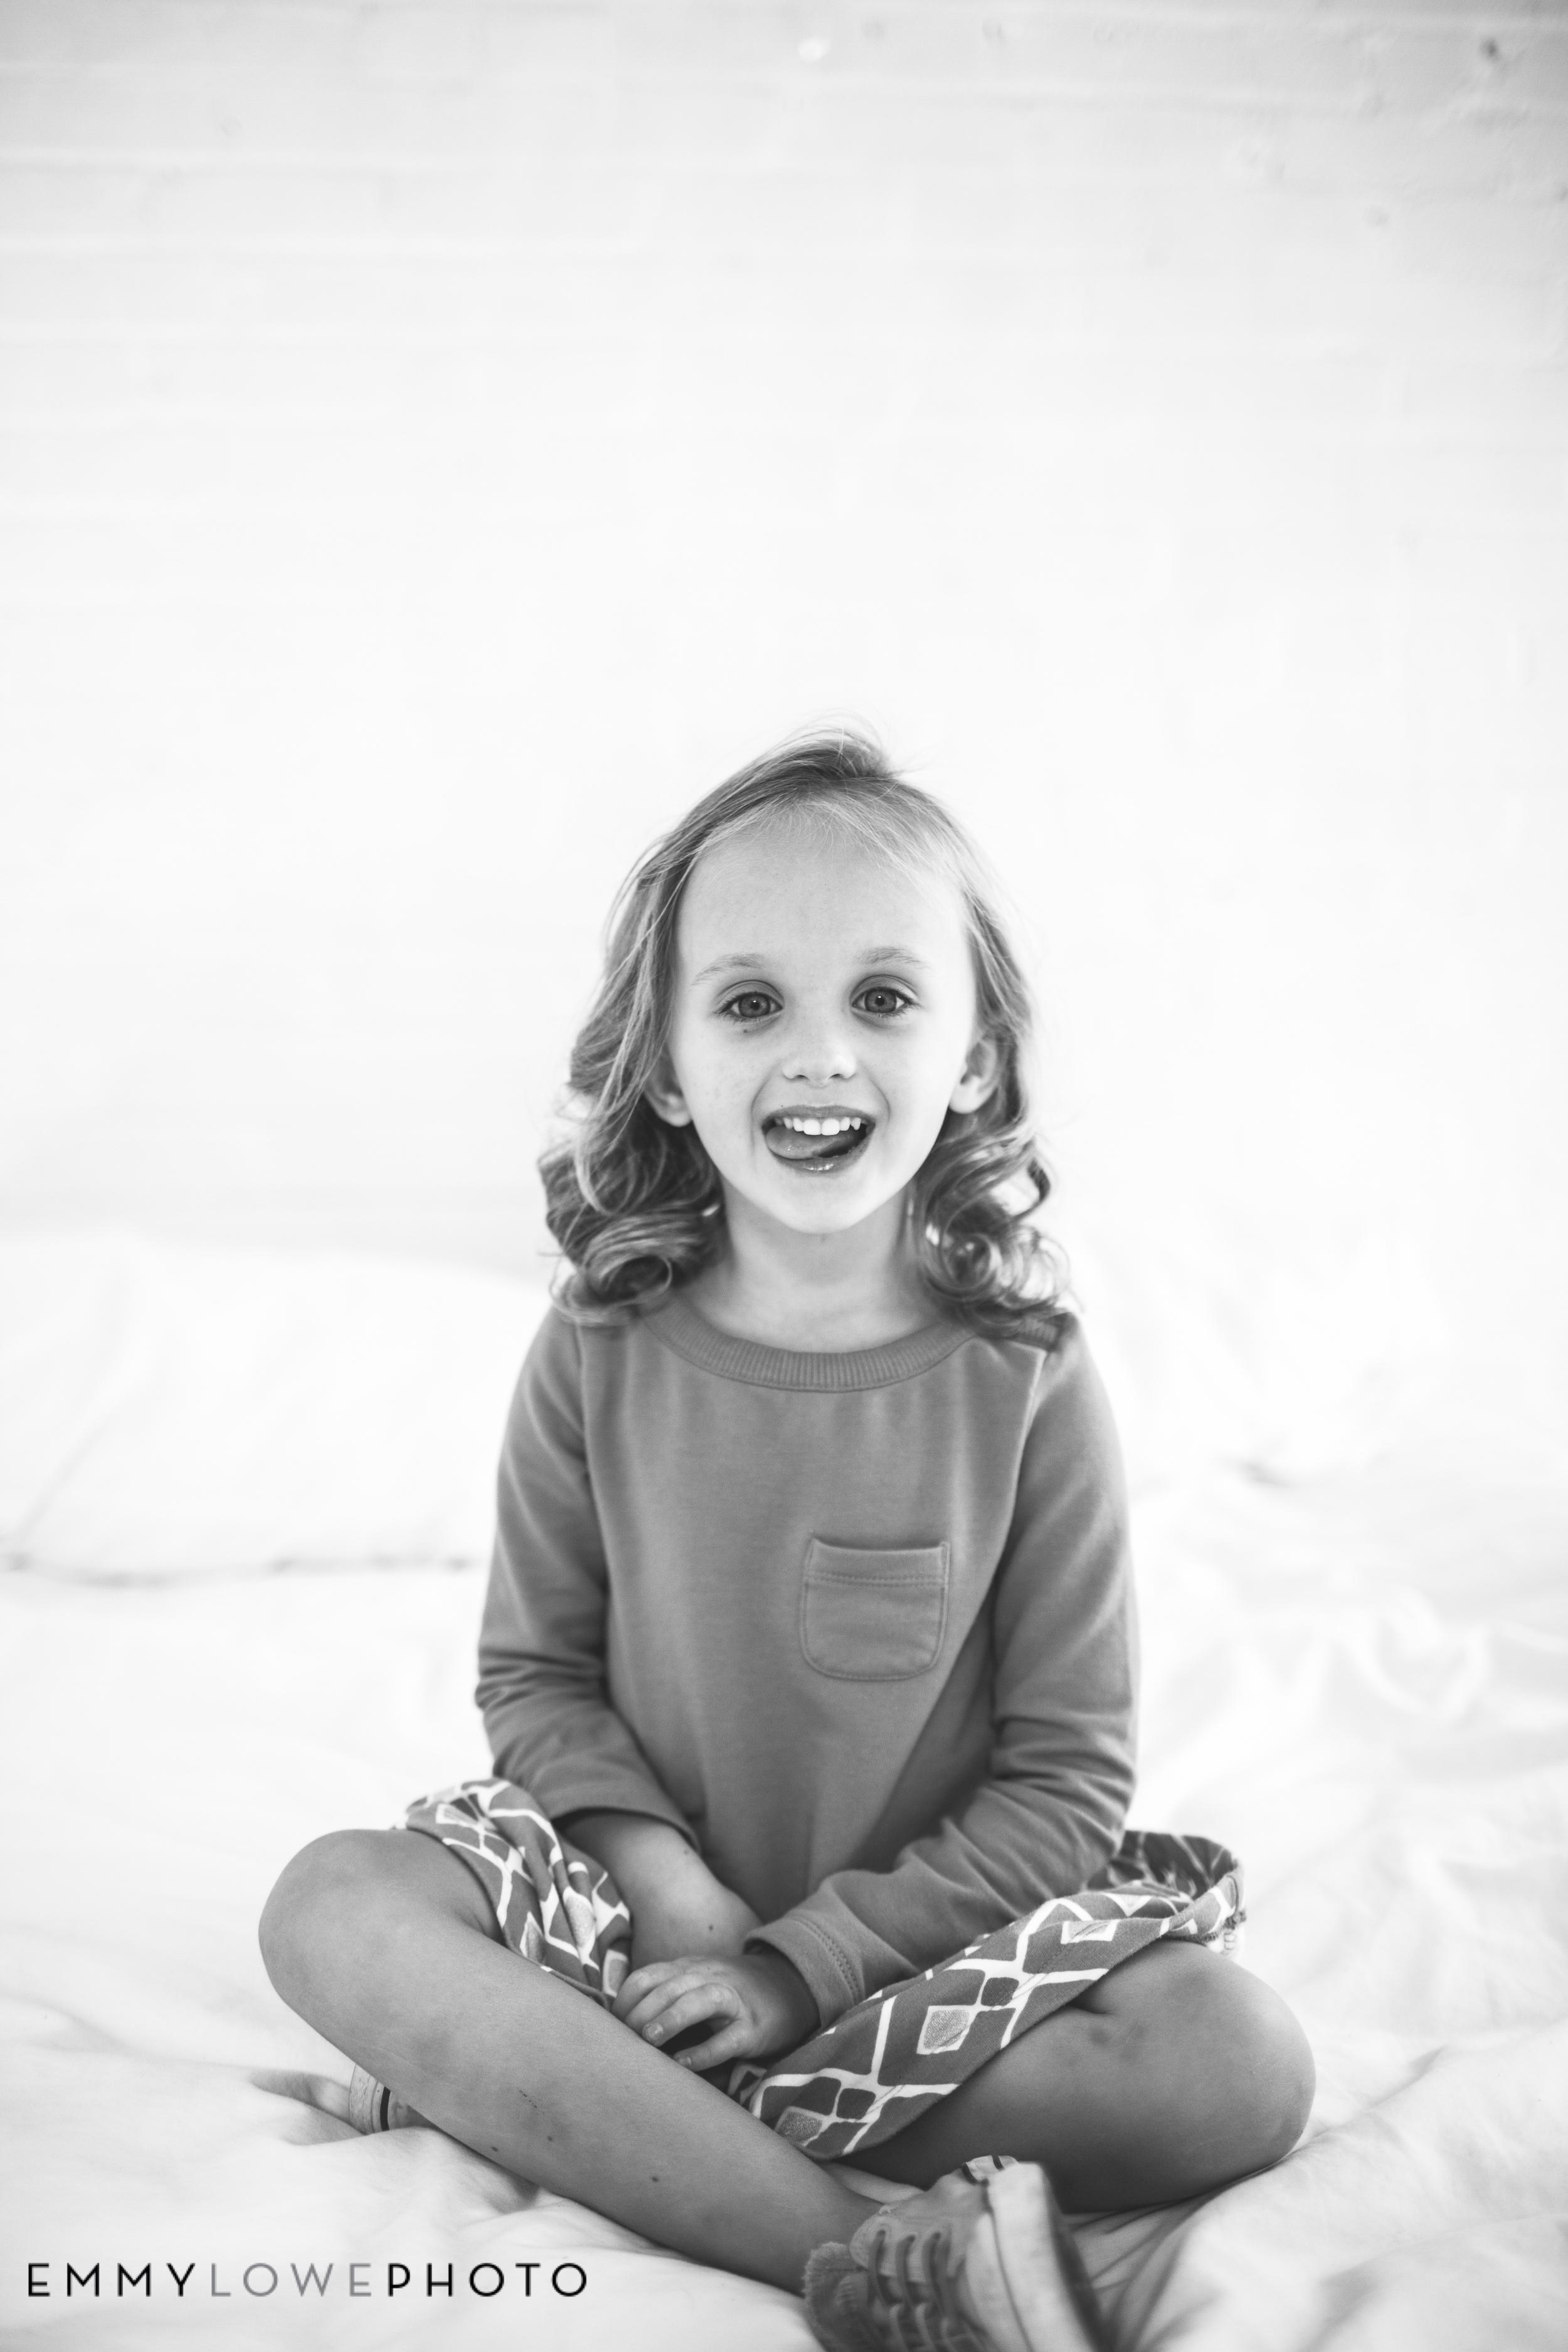 EmmyLowePhotoErinBrookBW-1.jpg